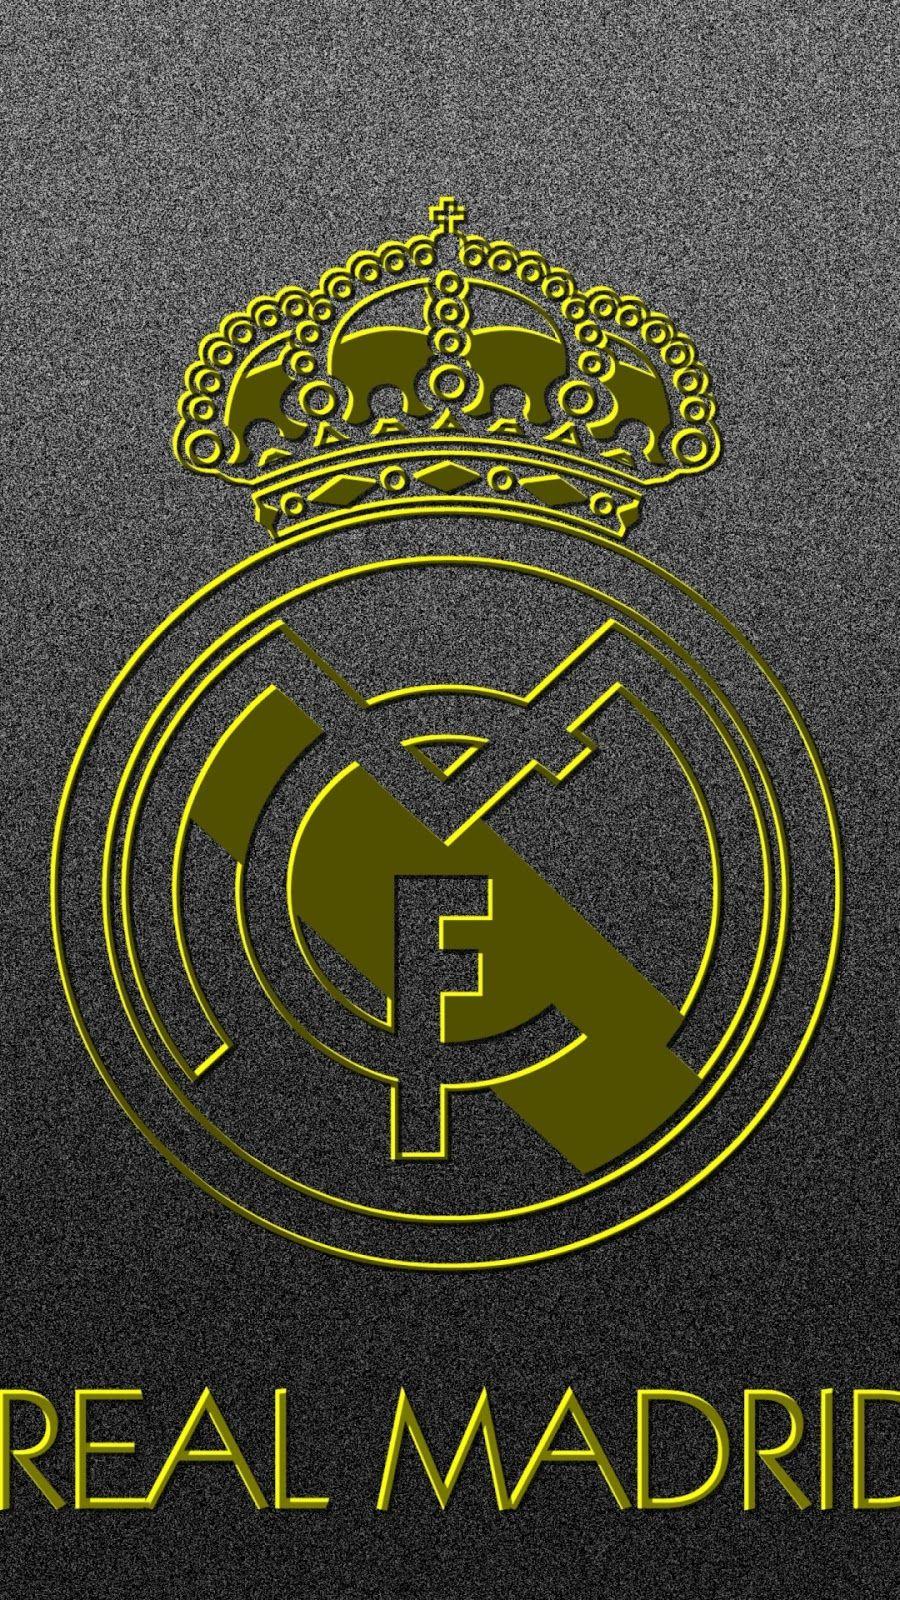 Real Madrid Whatsapp Wallpaper Real Madrid Wallpapers Madrid Wallpaper Real Madrid Logo